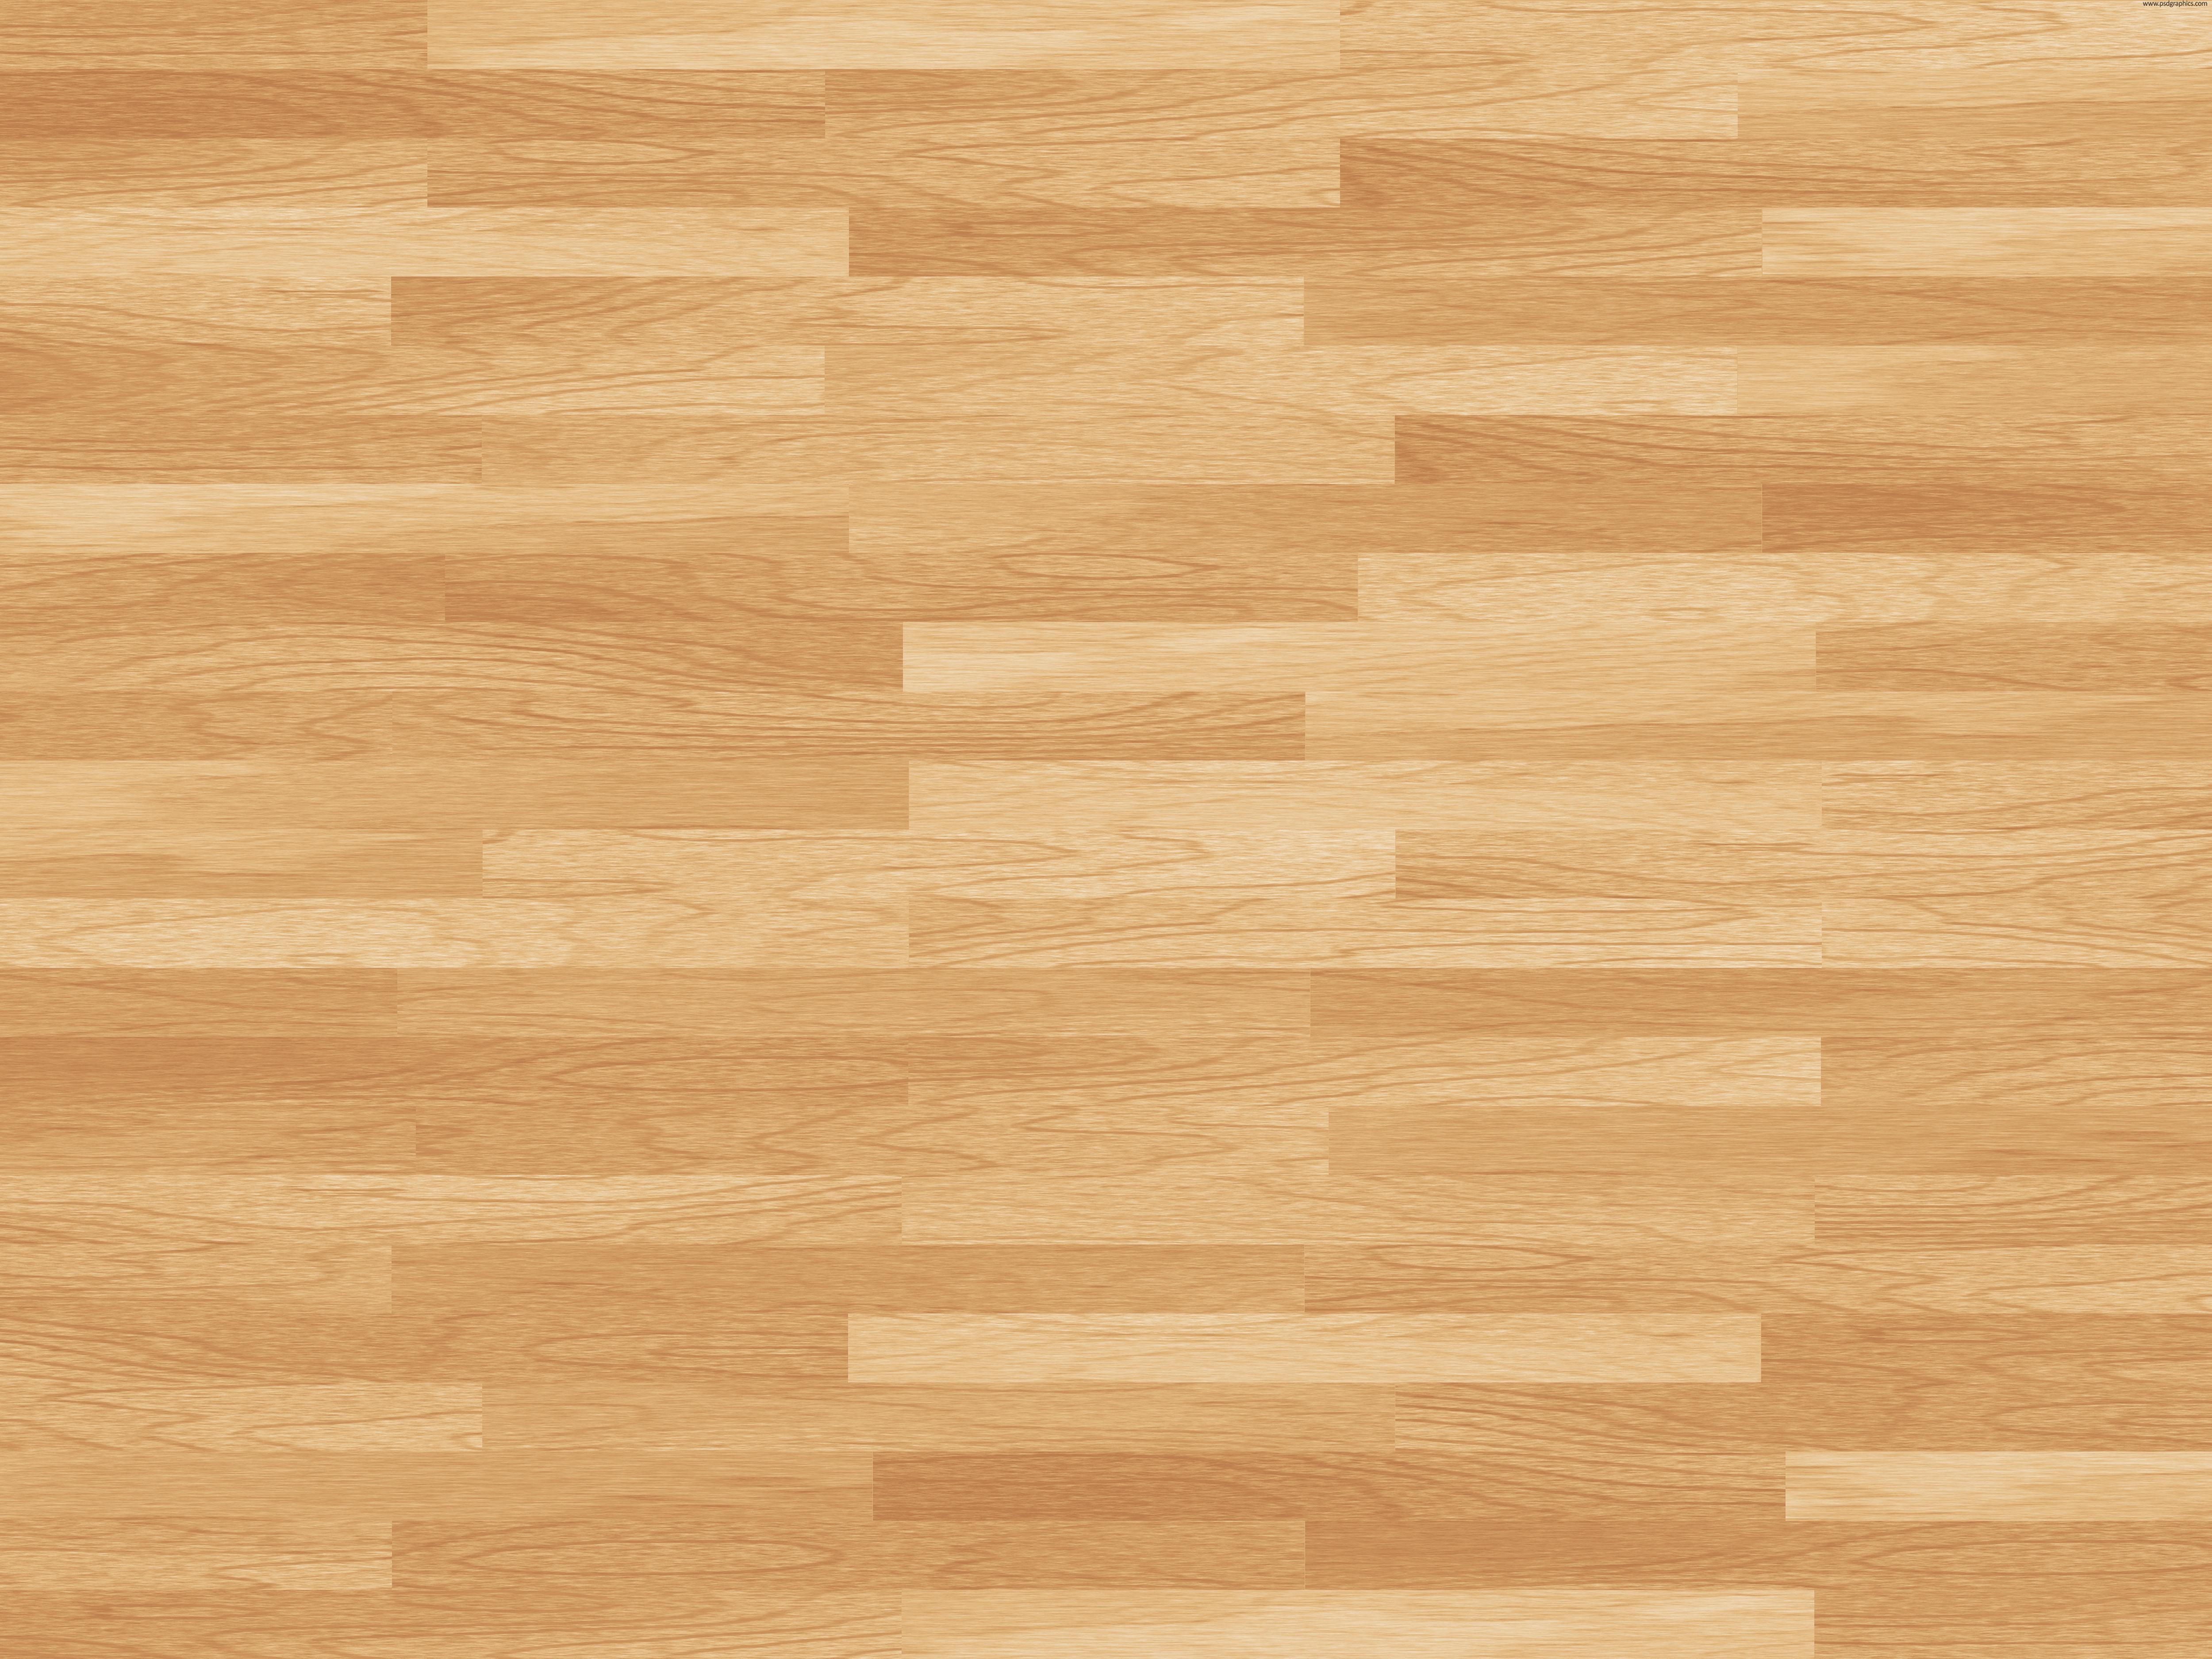 basketball court psd basketball floor texture   psdgraphics